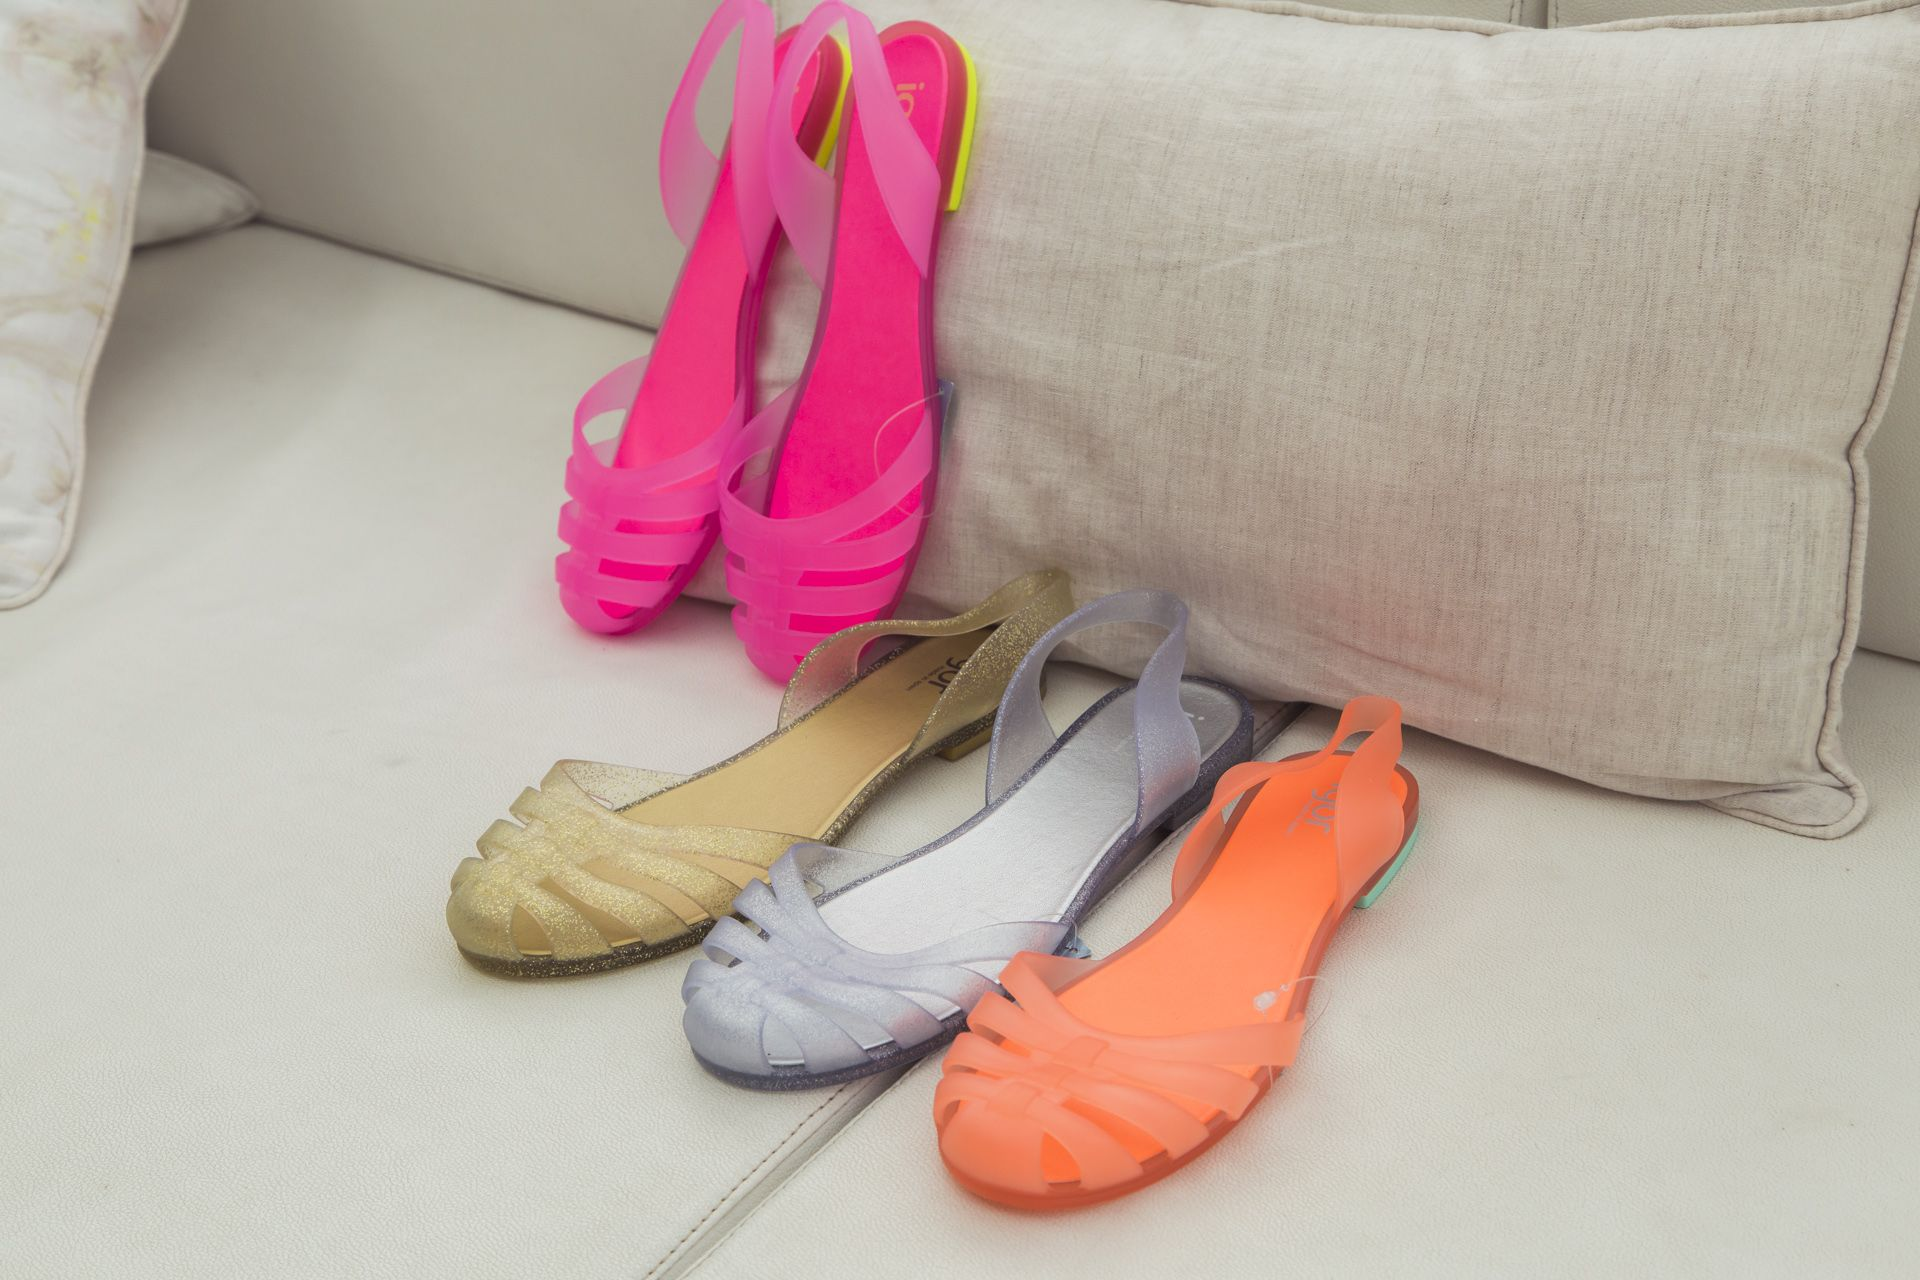 5d49090857b Sandalias de Goma para Mujer - Cangrejeras París - Con estas sandalias  modelo París estarás comodísima